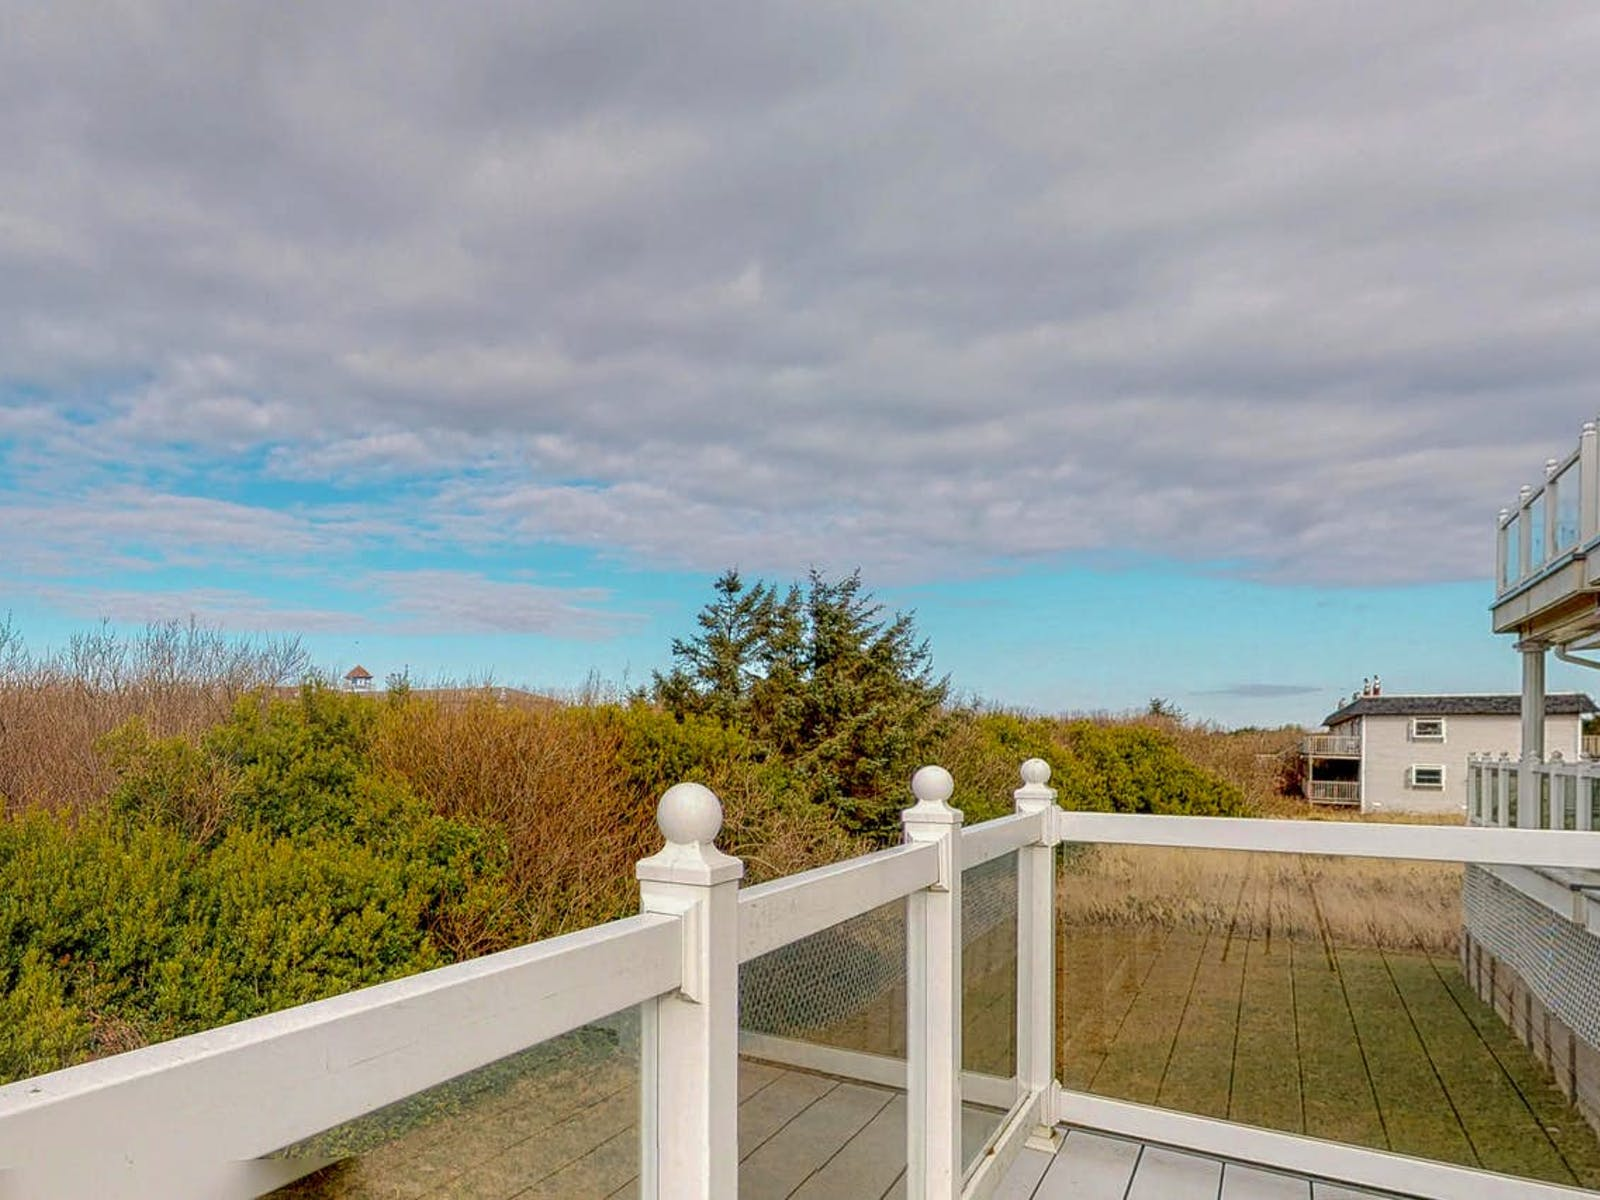 View from the balcony of Judith Ann Inn